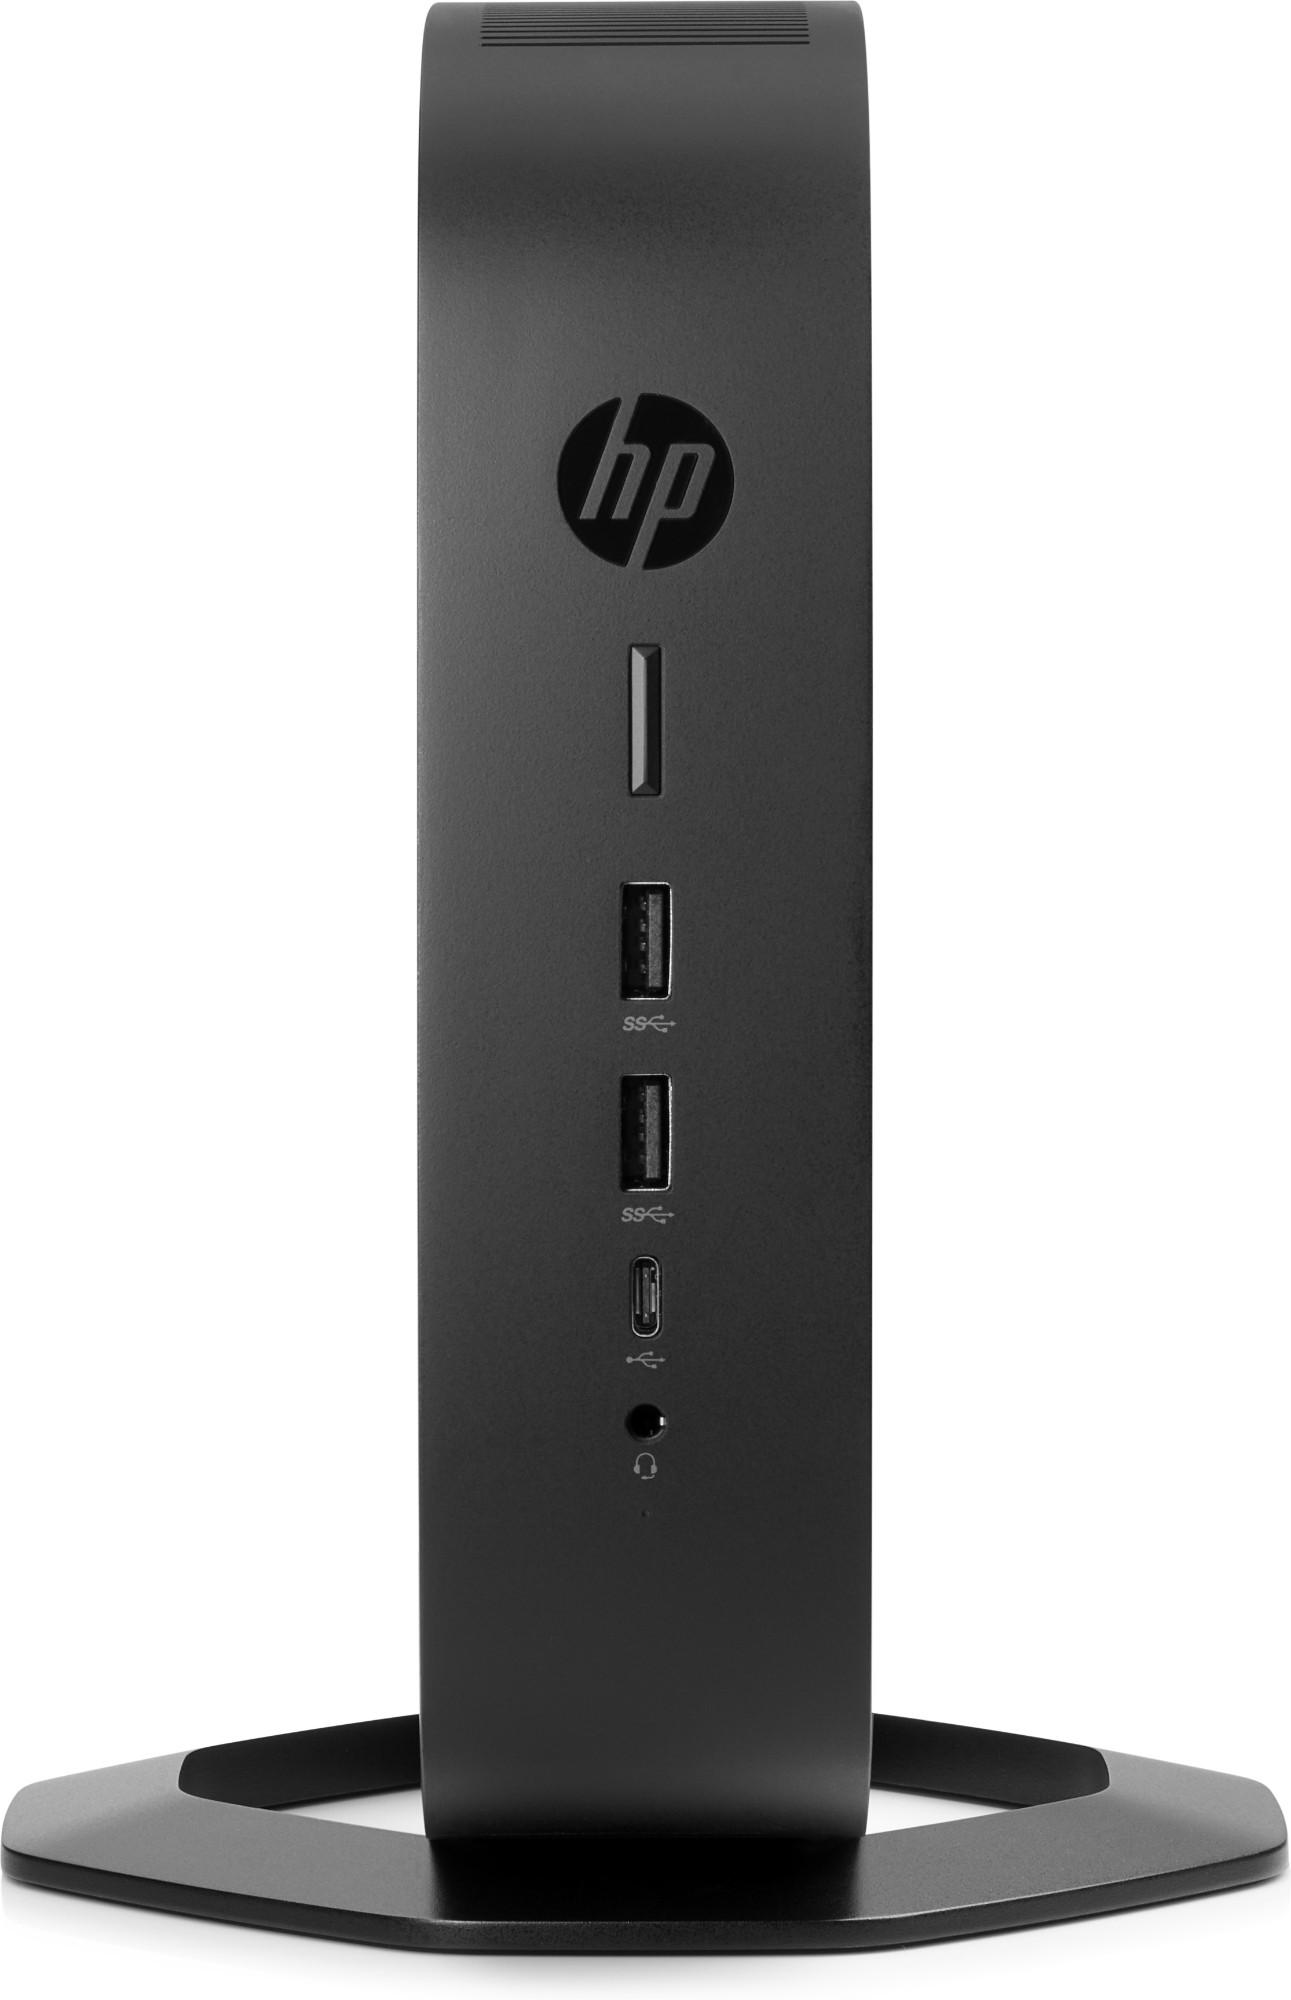 HP t740 2.4 GHz R1505G Windows 10 IoT Enterprise 1.33 kg